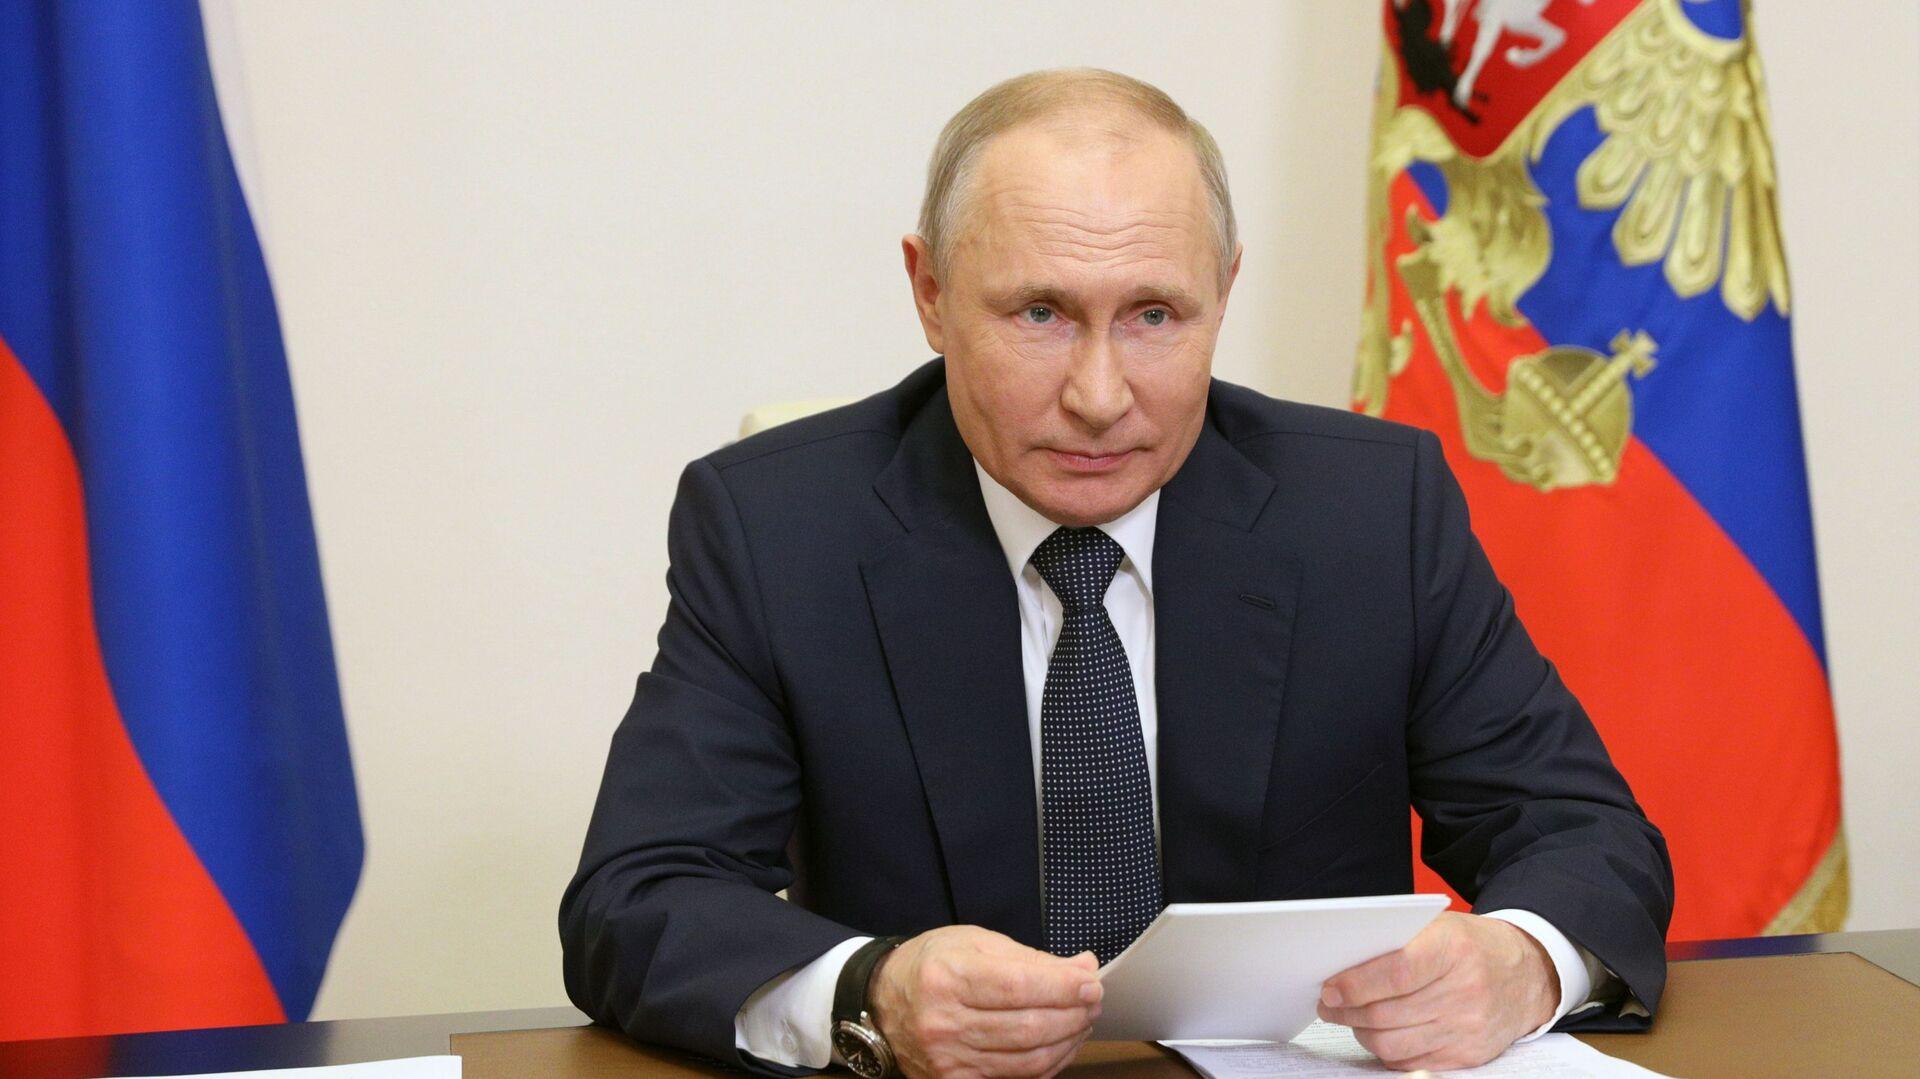 Russian President Vladimir Putin - Sputnik International, 1920, 14.09.2021